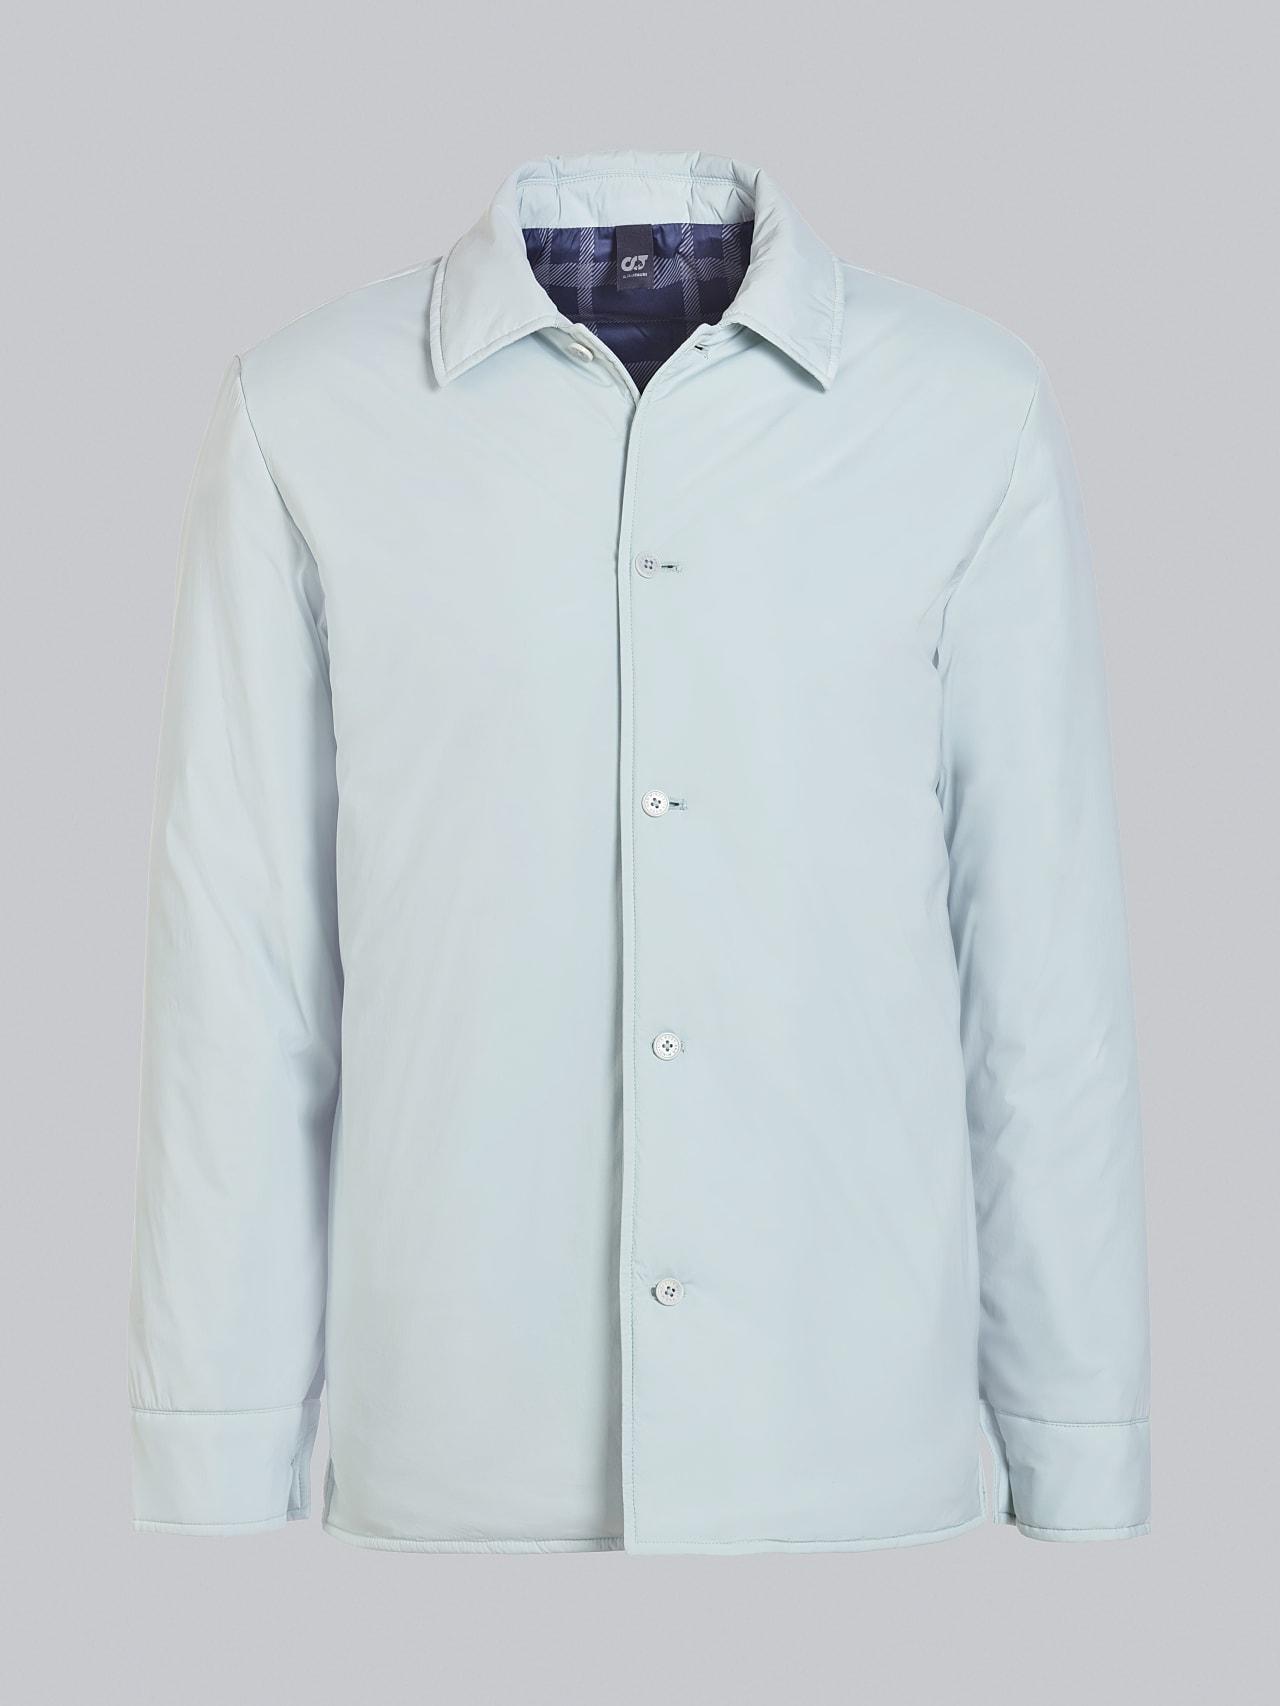 OVASU V1.Y5.02 PrimaLoft® Overshirt Jacket Pale Blue  Back Alpha Tauri